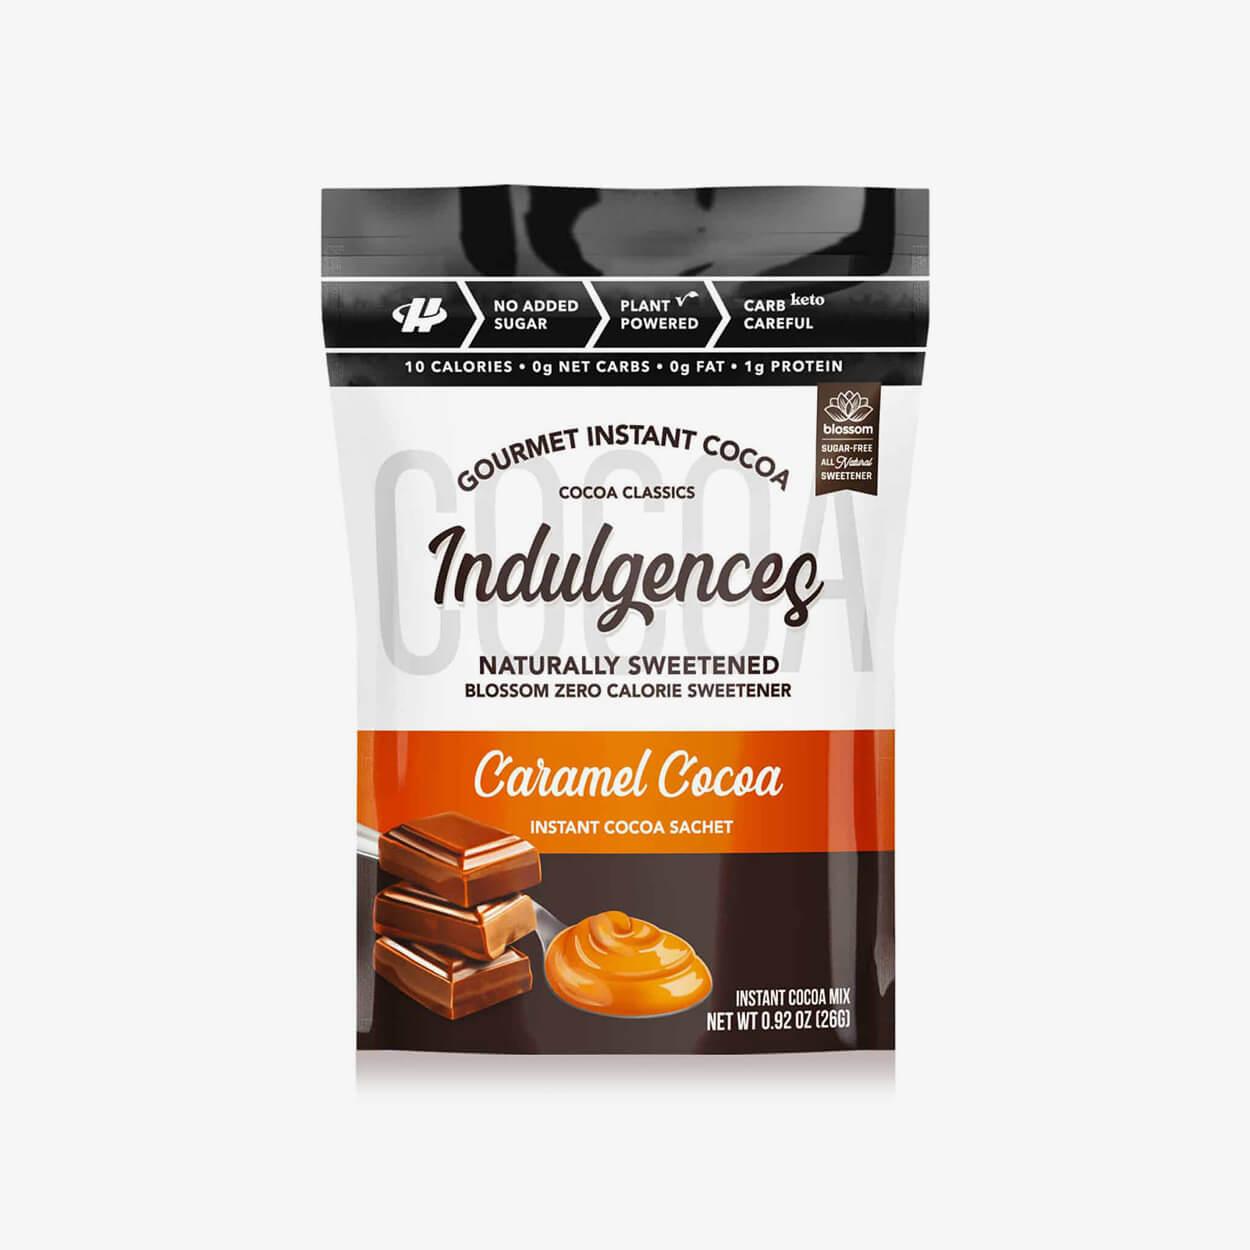 Caramel Cocoa - Indulgences - Halo Healthy Tribes